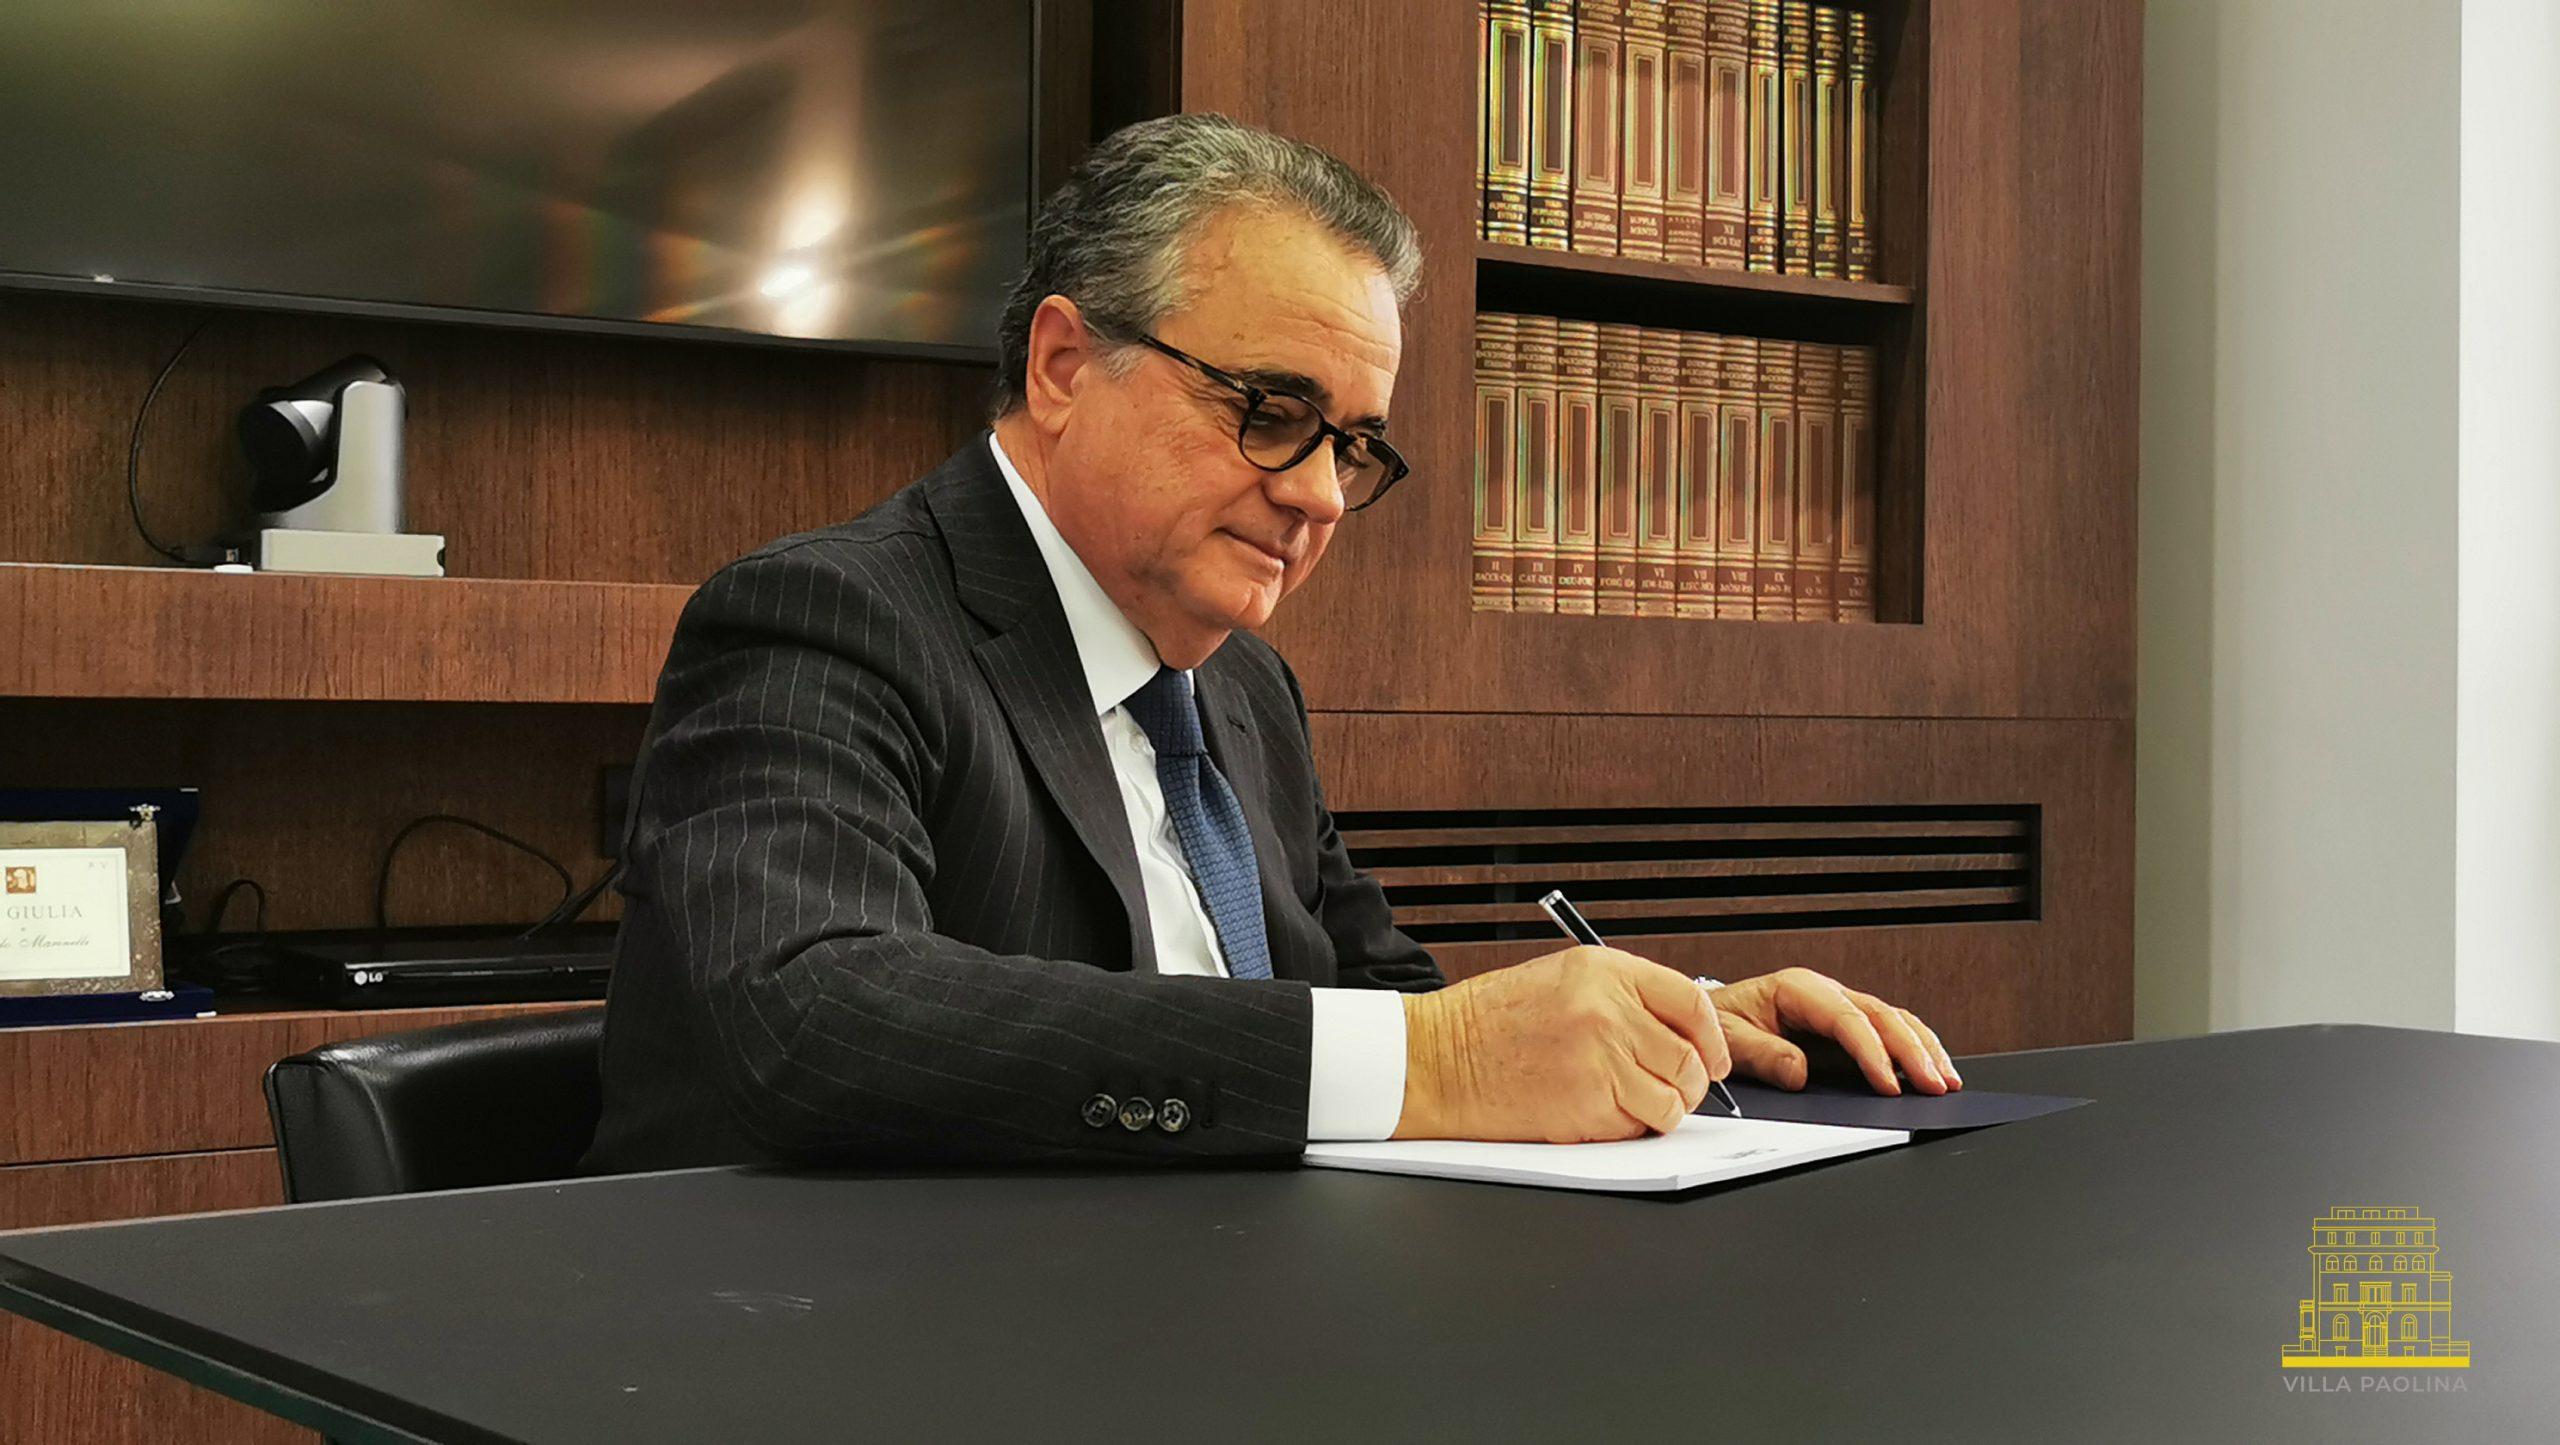 L'Ingegnere Angelo Marinelli